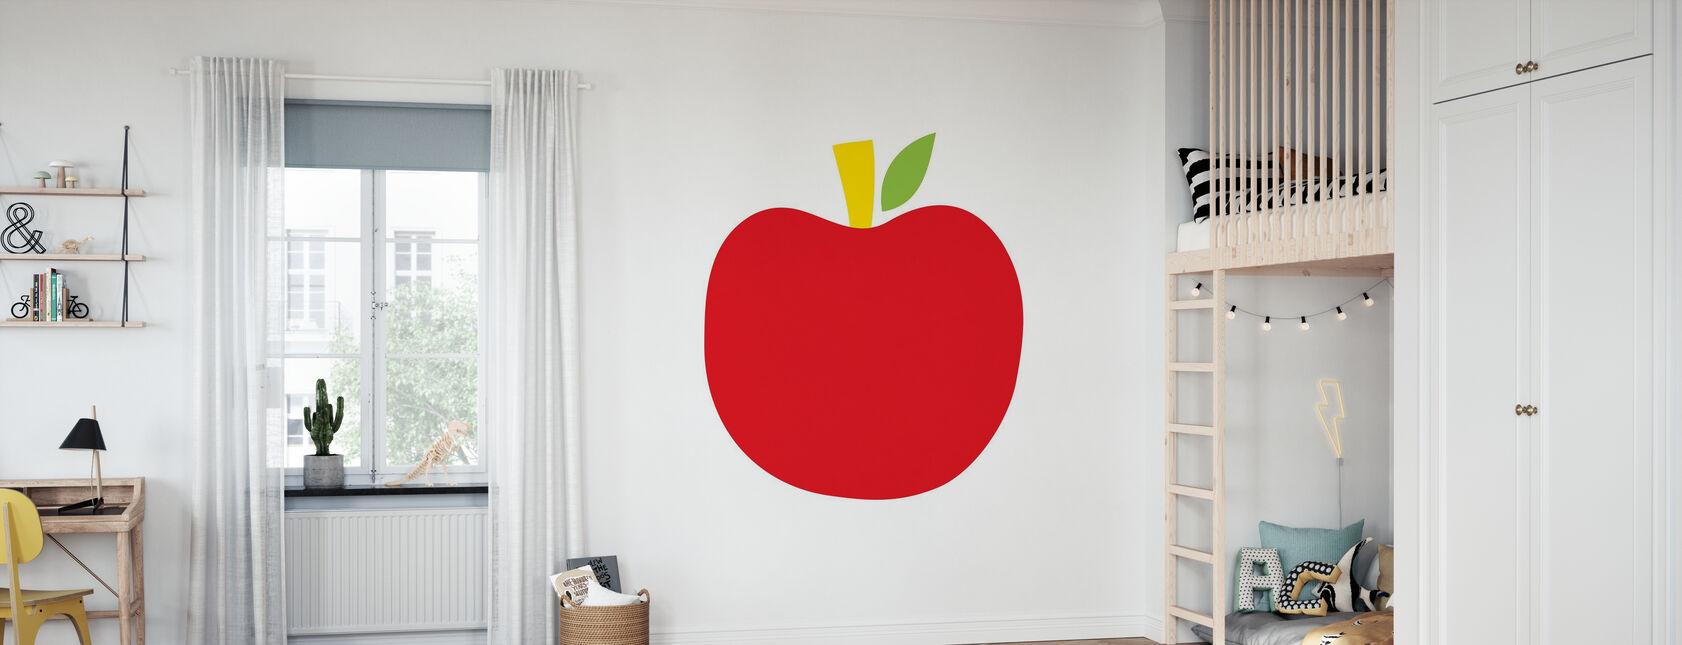 Red Apple - Wallpaper - Kids Room